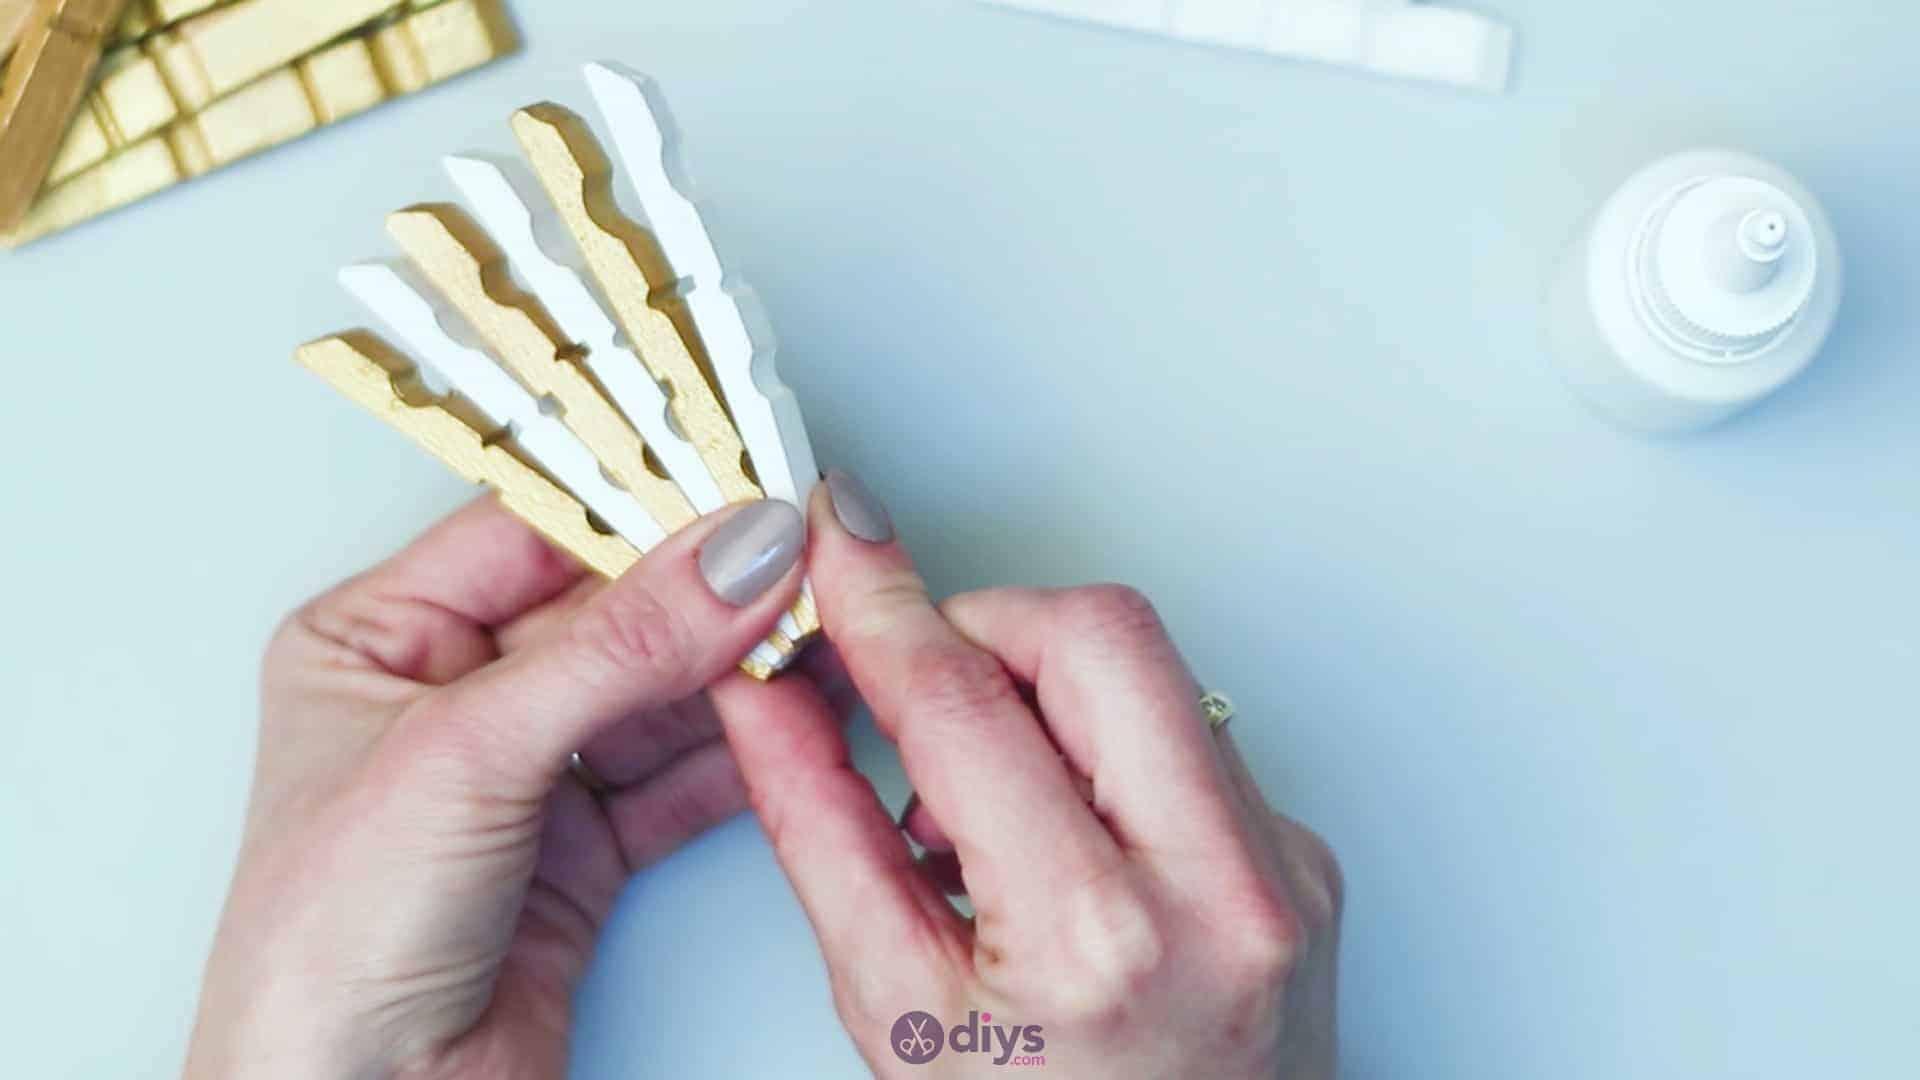 Diy clothespin art step 5g